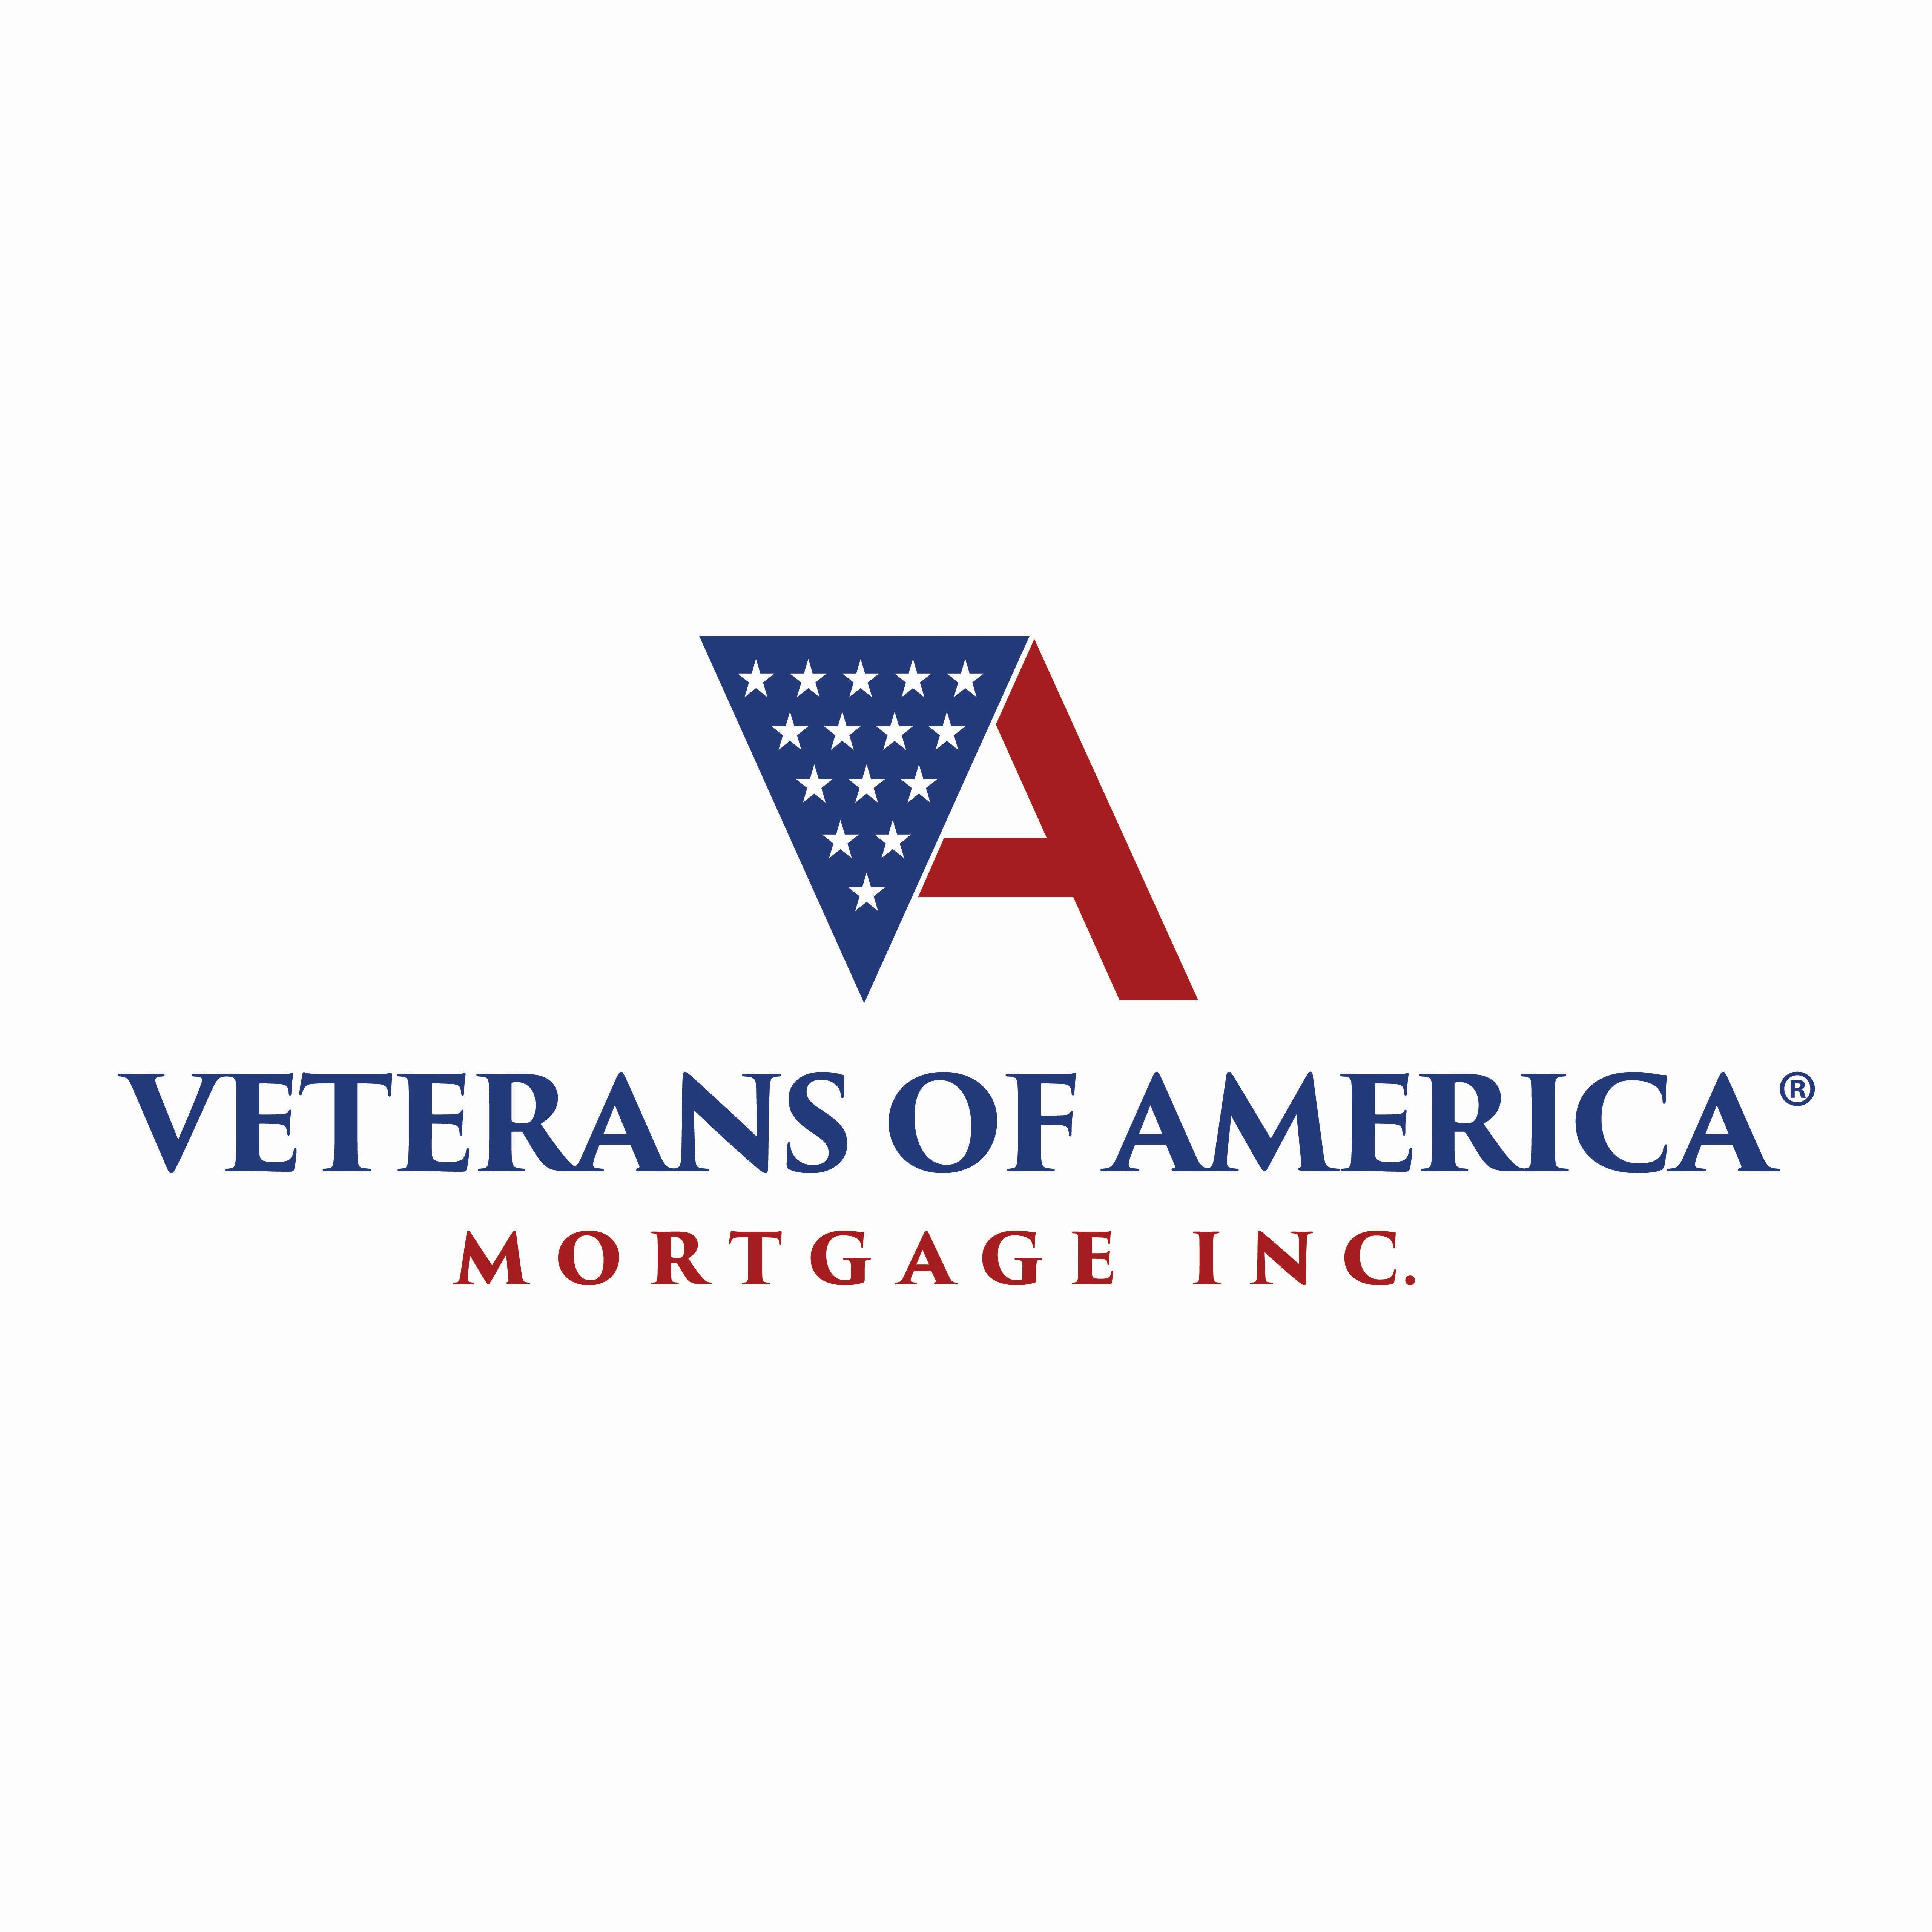 Veterans of America Mortgage